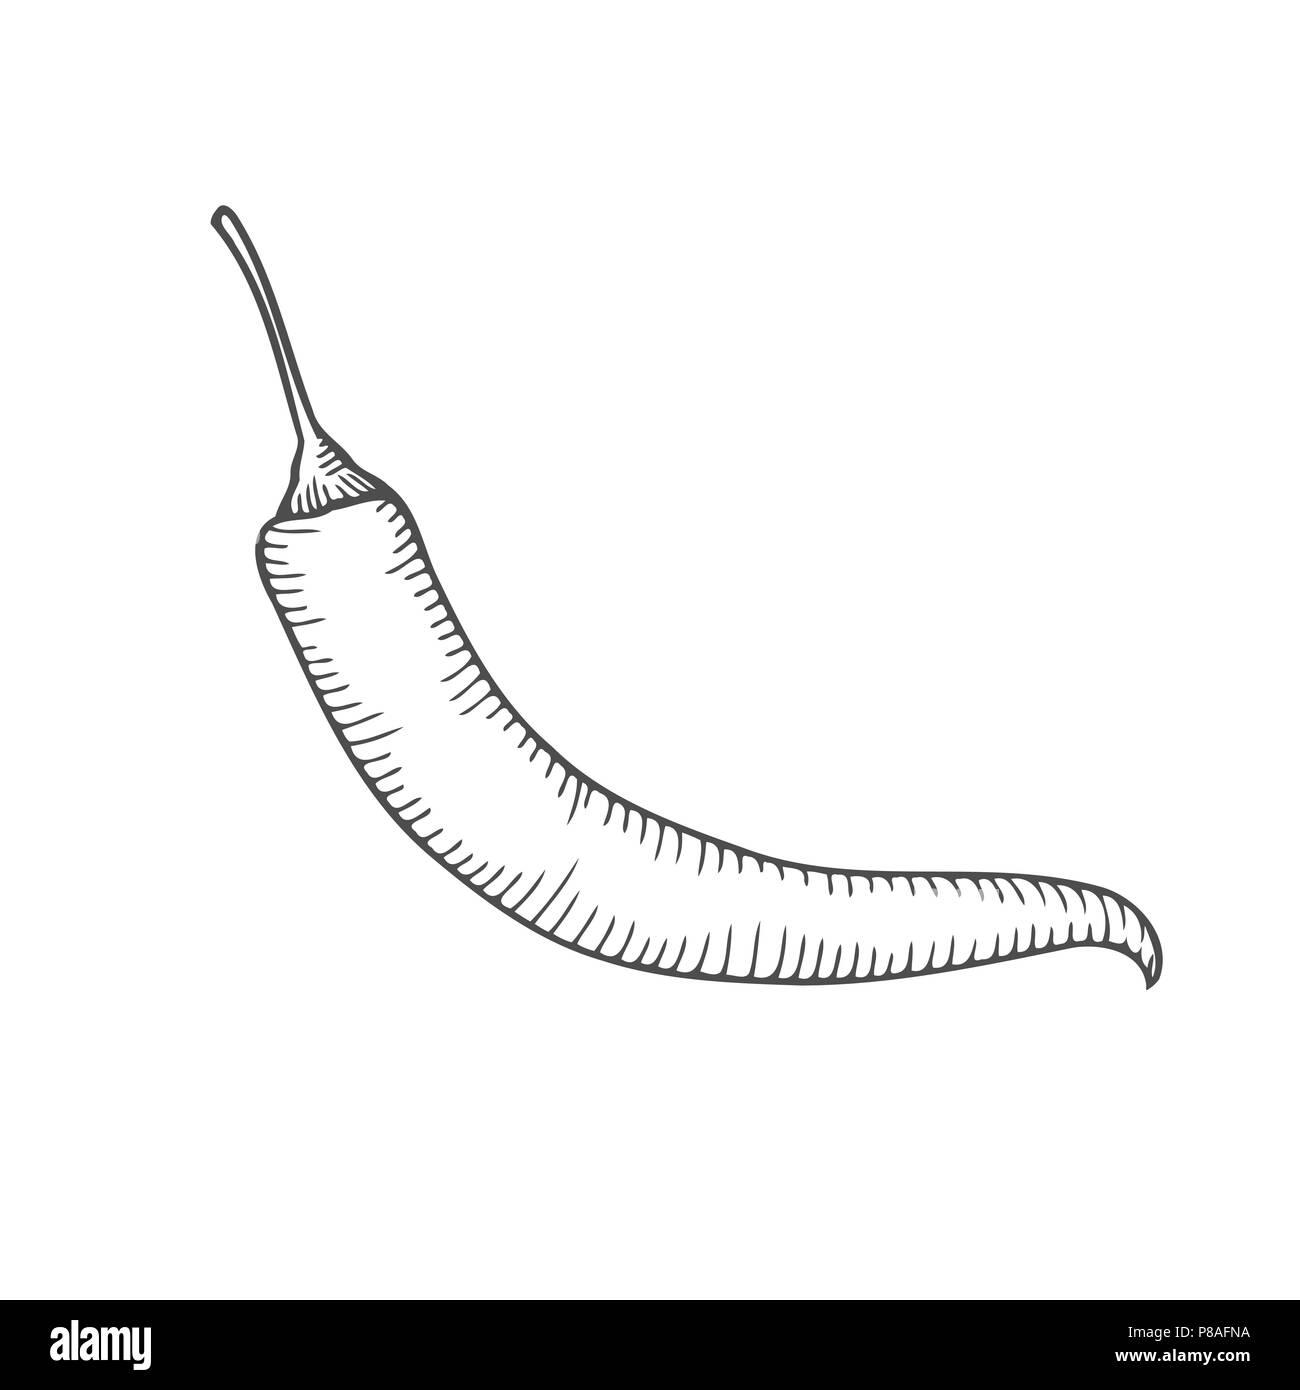 Chilly Hot Pepper Vektor Handgezeichnete Illustrationen